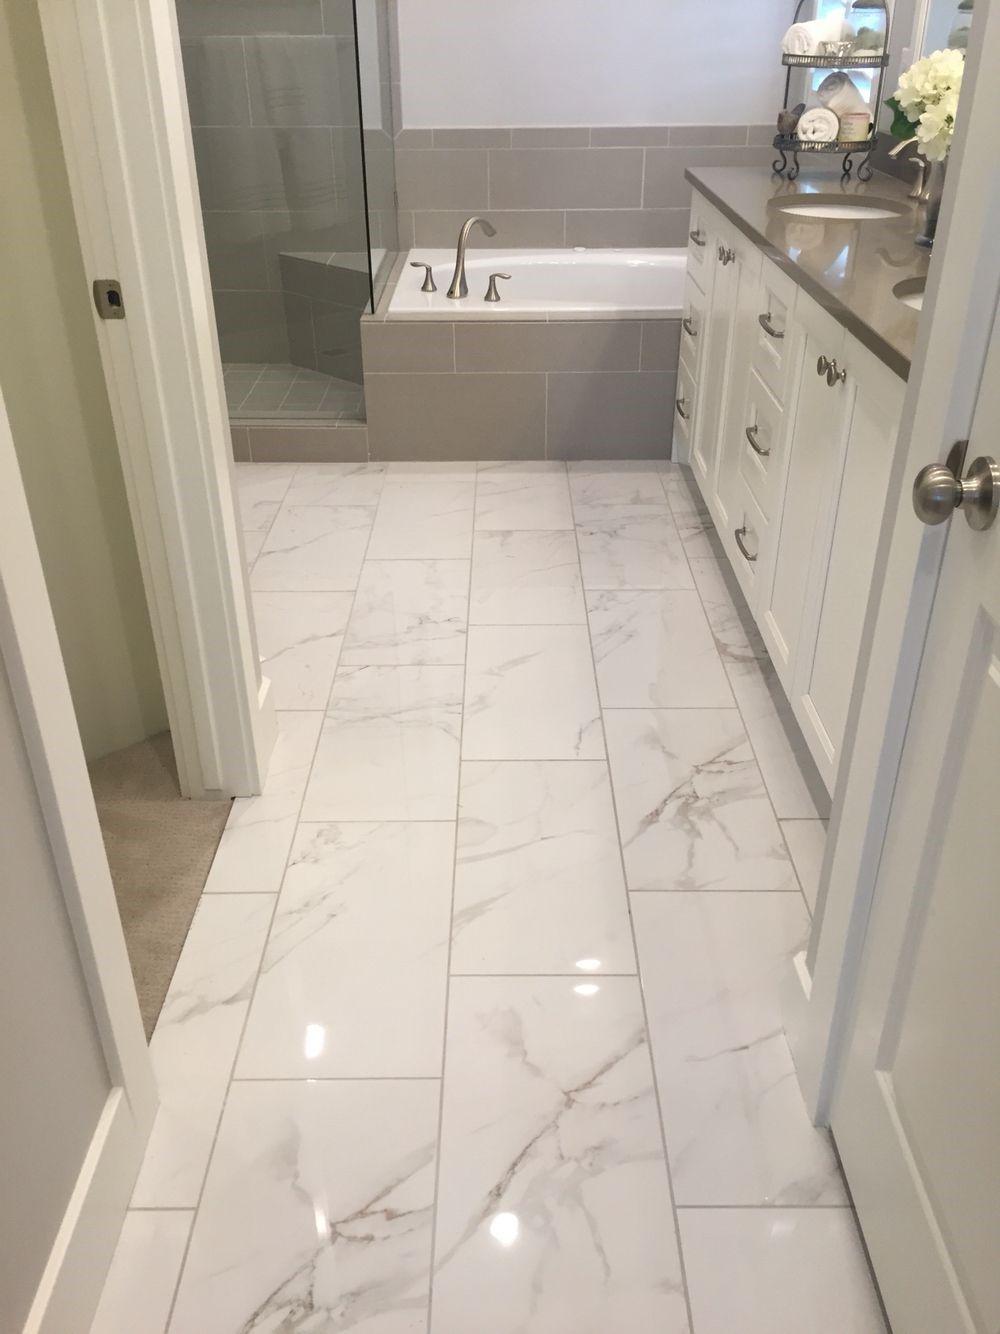 Bathroom Categories Beautiful Bathroom Farmhouse Decor In 2020 Marble Tile Bathroom Bathroom Tile Designs Bathrooms Remodel